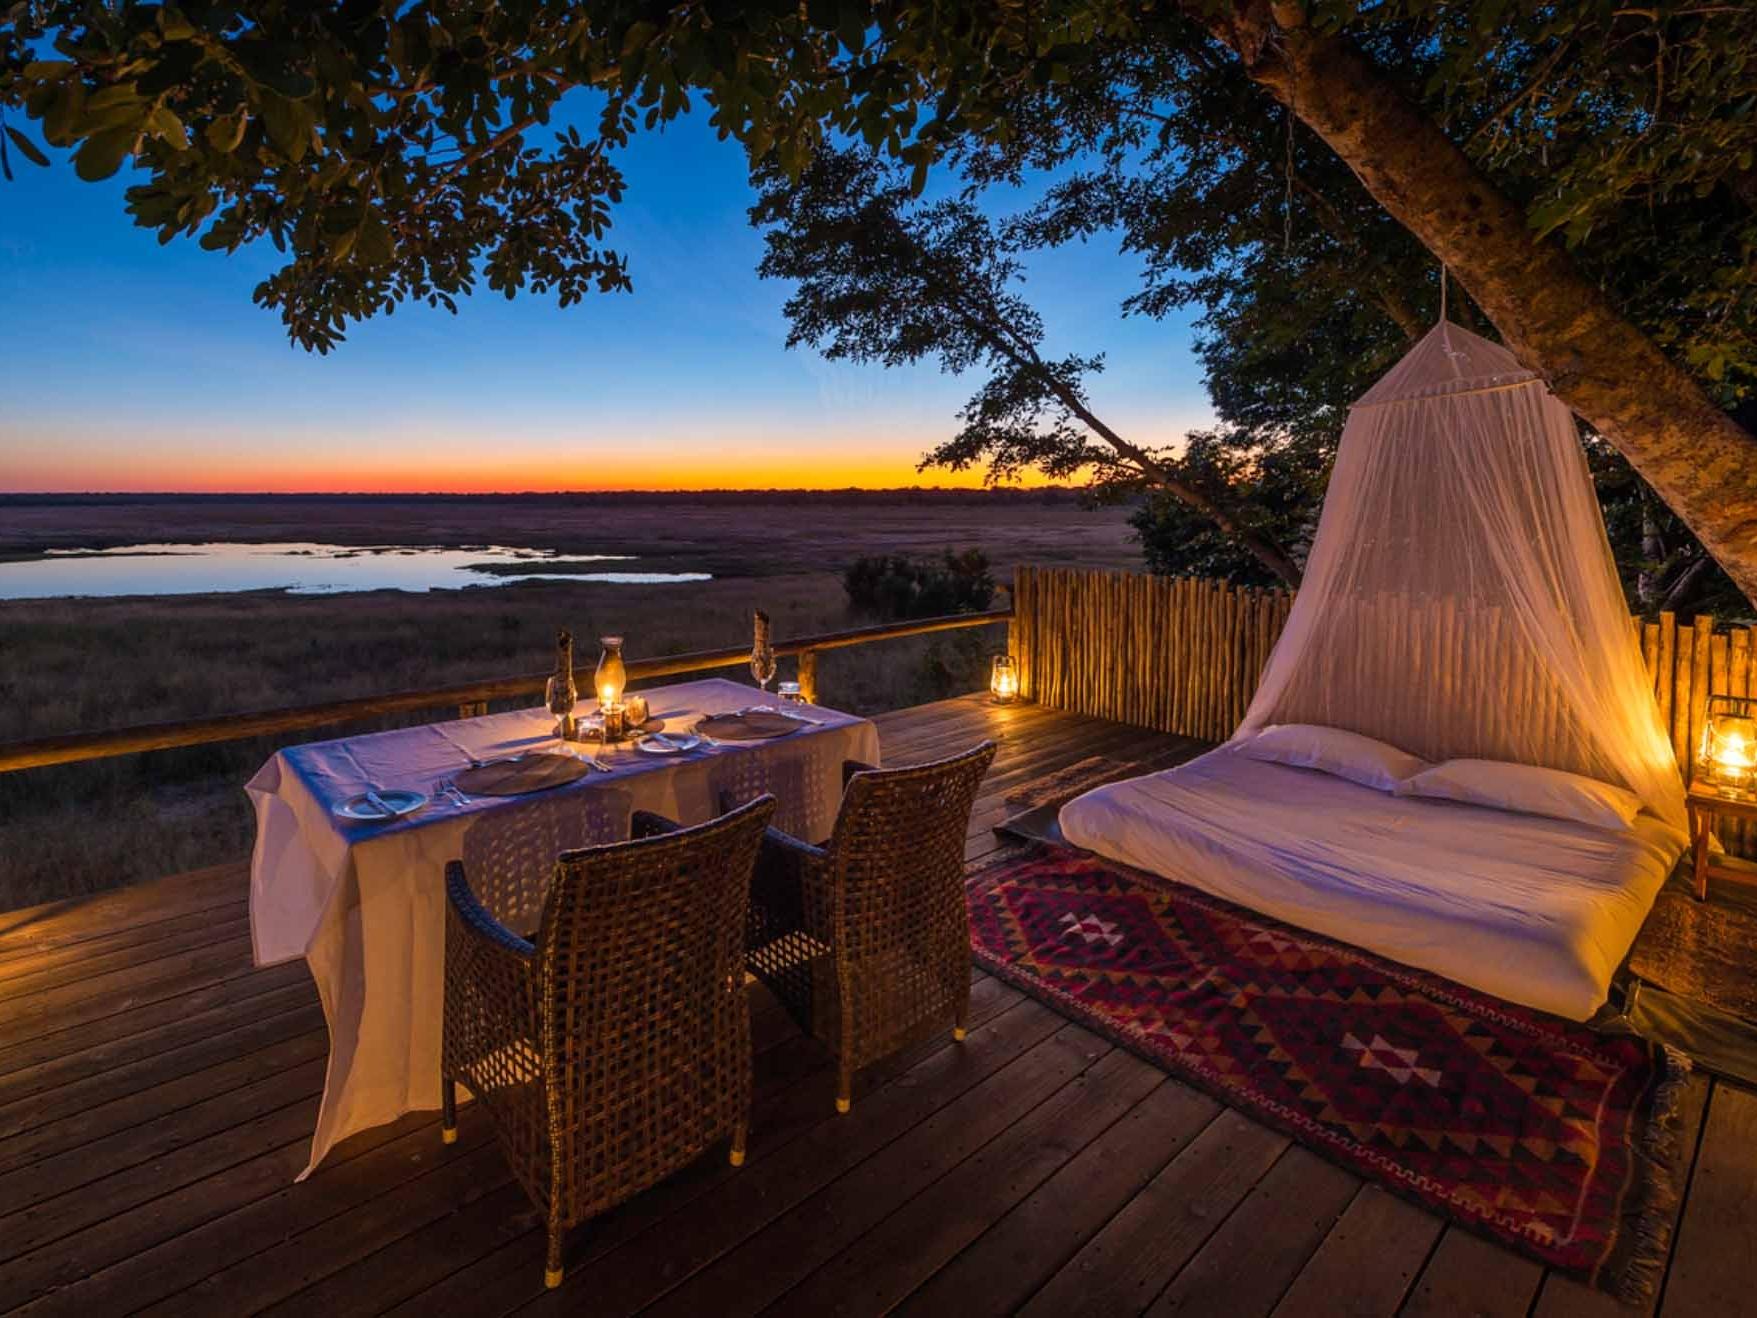 sally-and-alice-travel-luxury